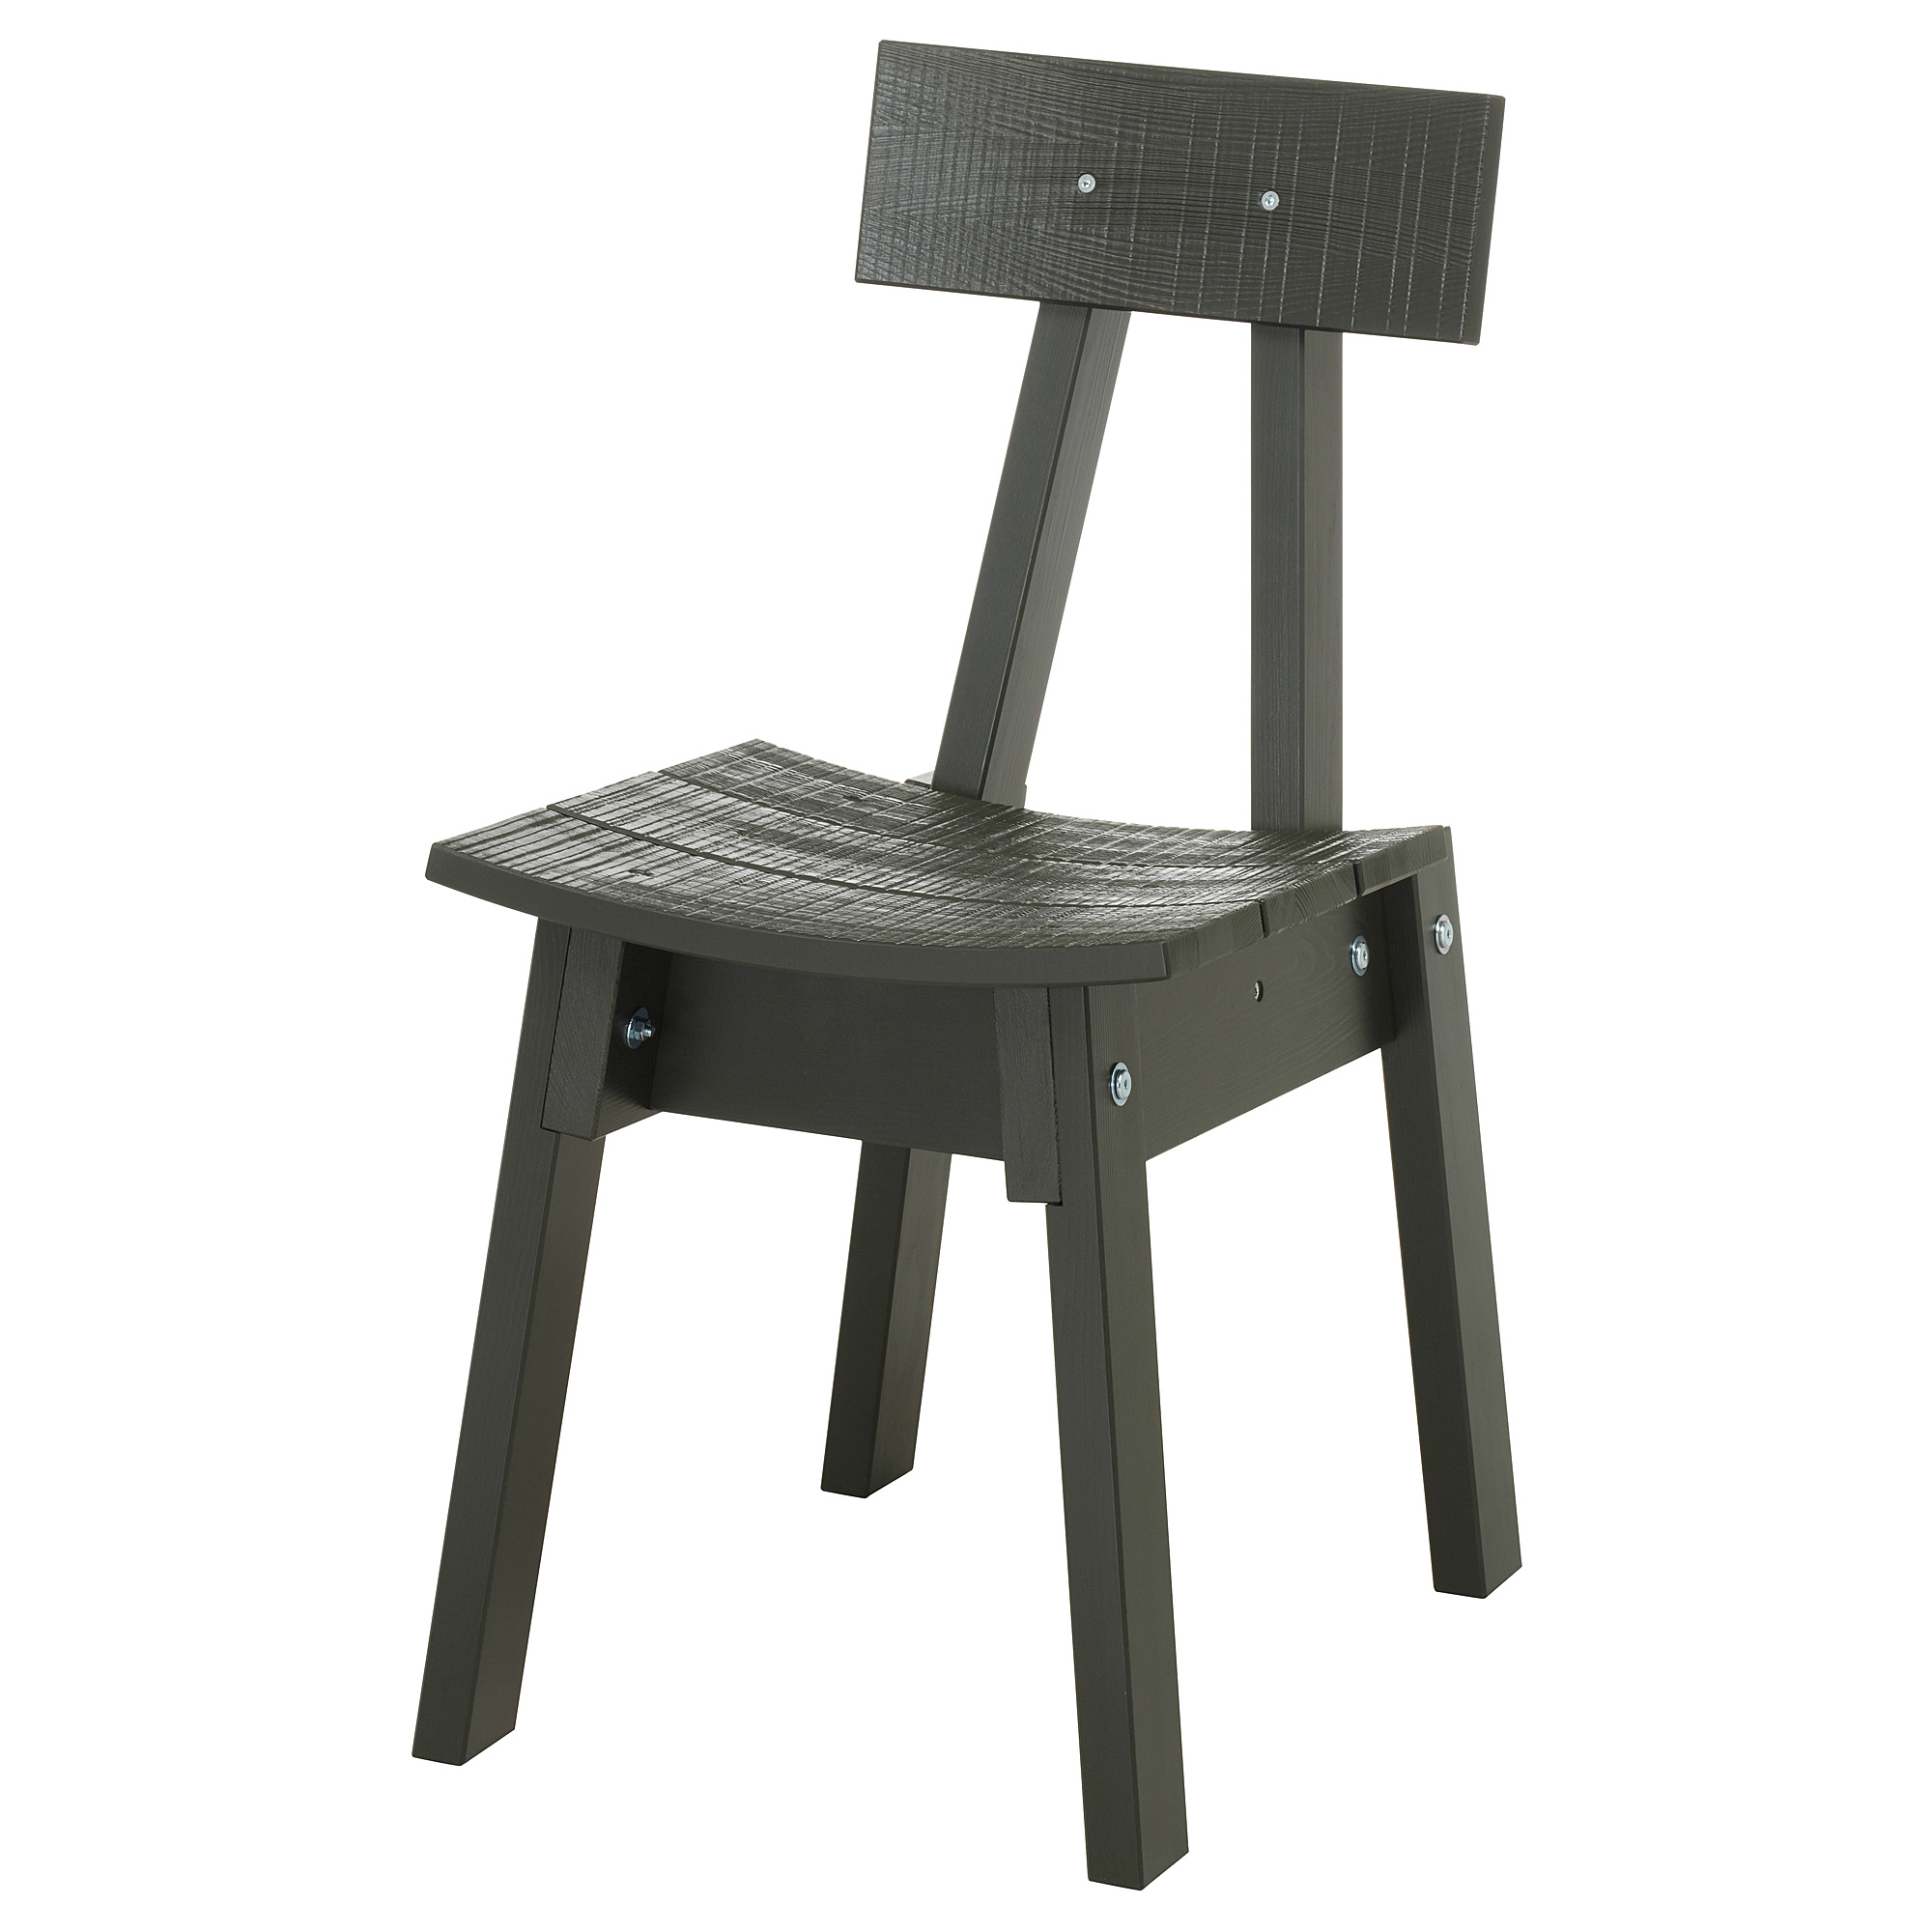 Стул ИНДУСТРИЕЛЛ артикуль № 703.945.22 в наличии. Online сайт IKEA РБ. Недорогая доставка и монтаж.